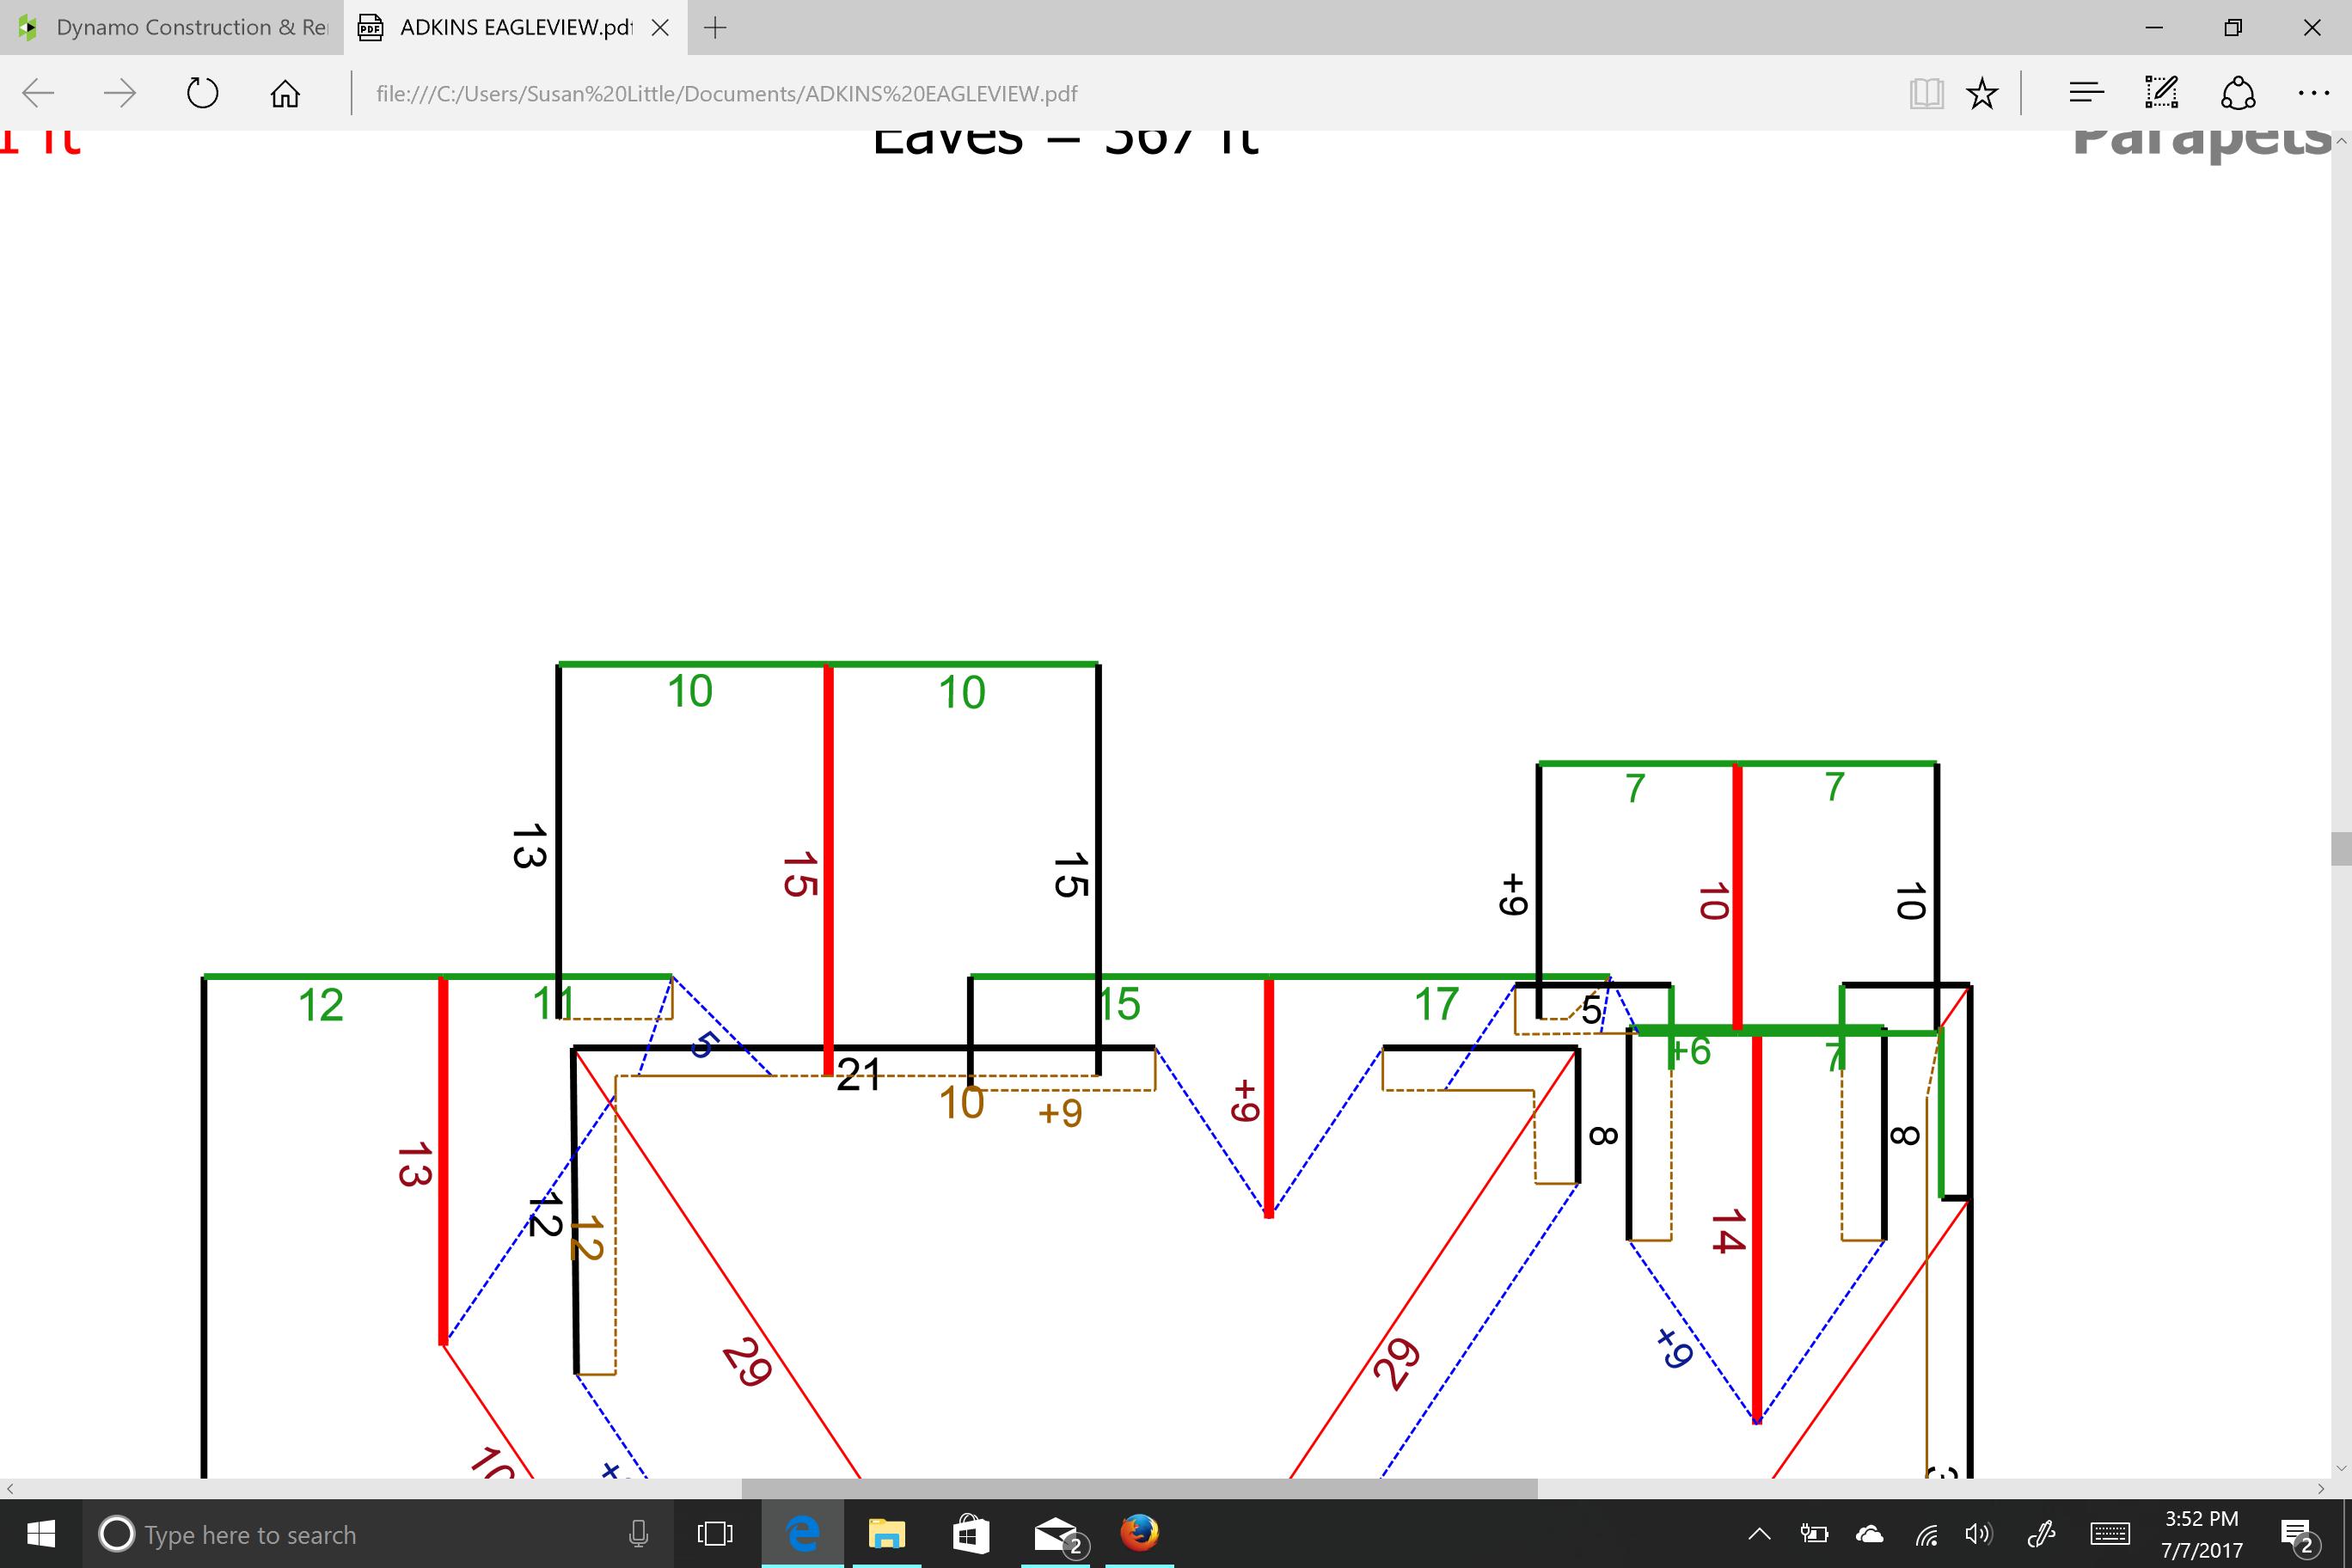 Concrete help-screenshot-16-.png